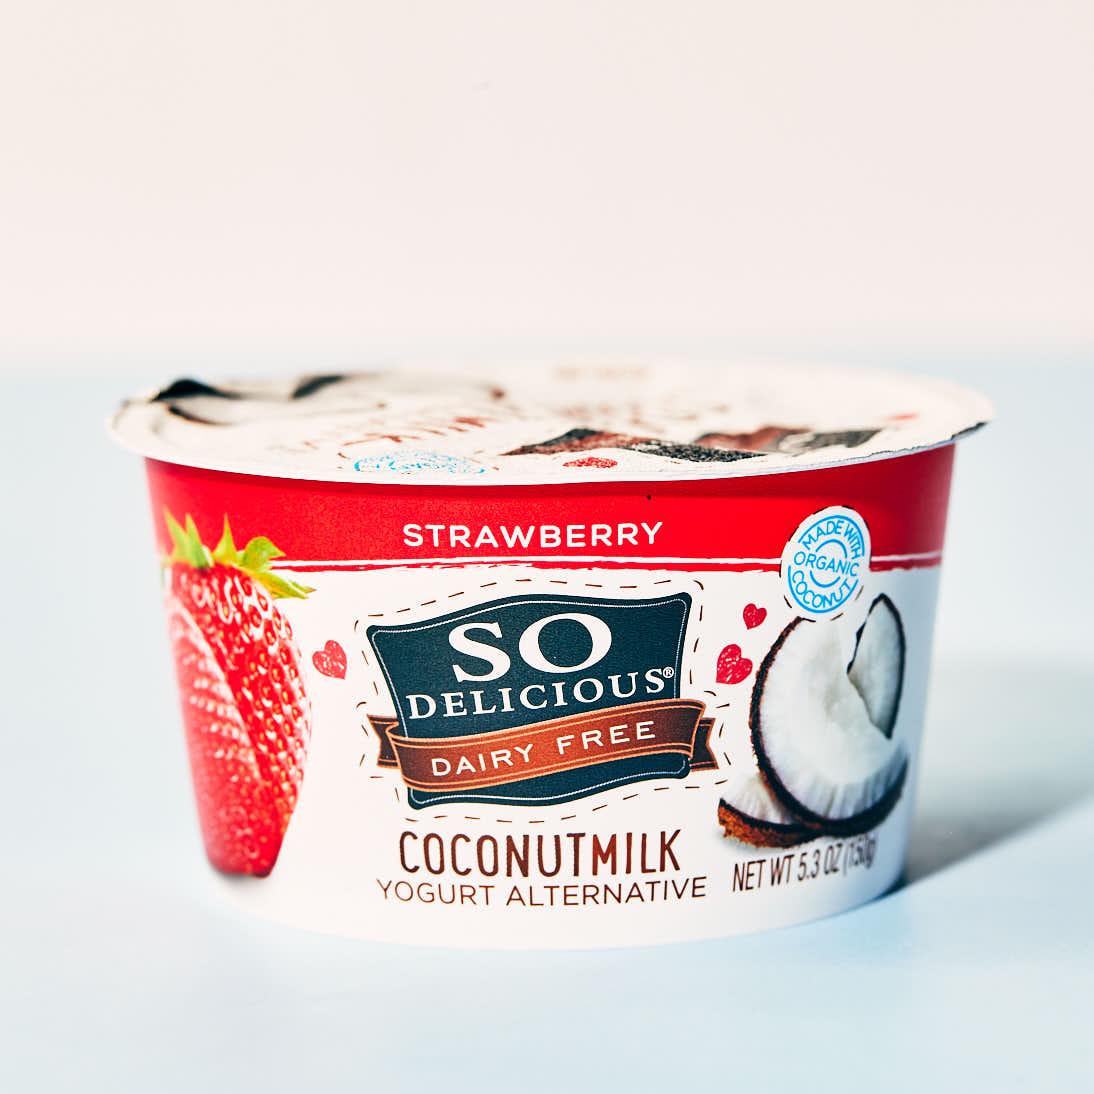 So Delicious Coconut Milk - Strawberry.jpg